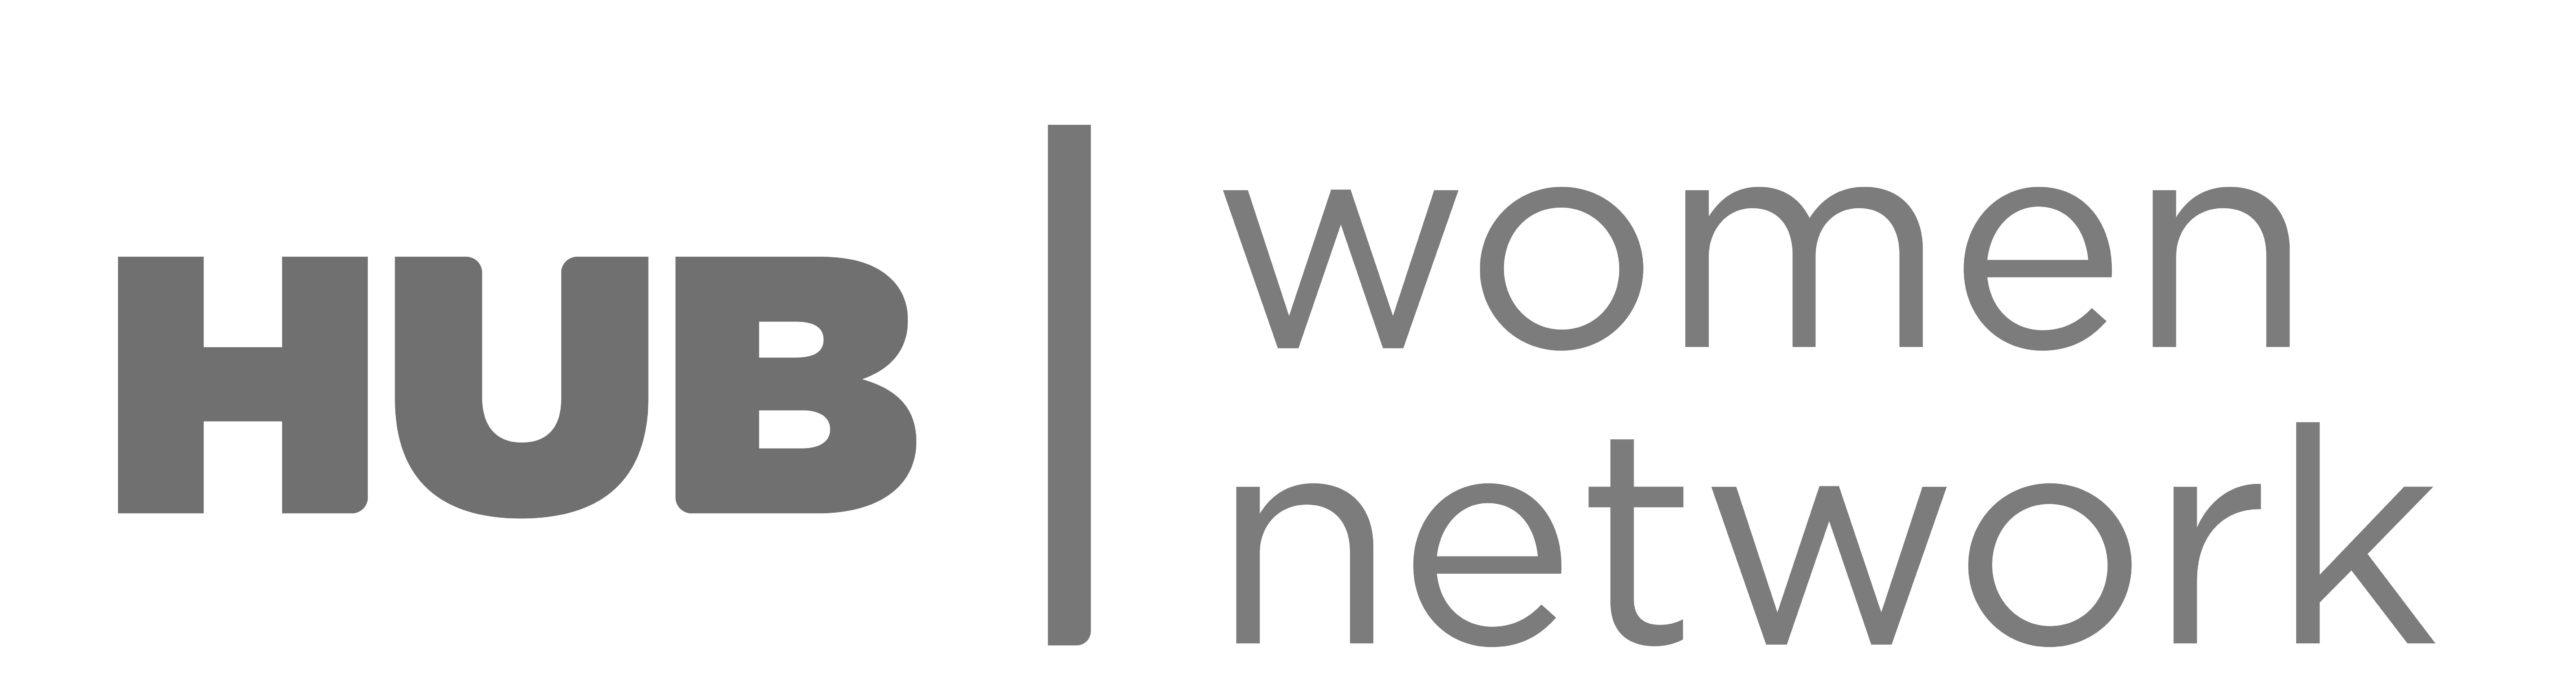 HUB-WomenNetwork-Full-Color-RGBG2